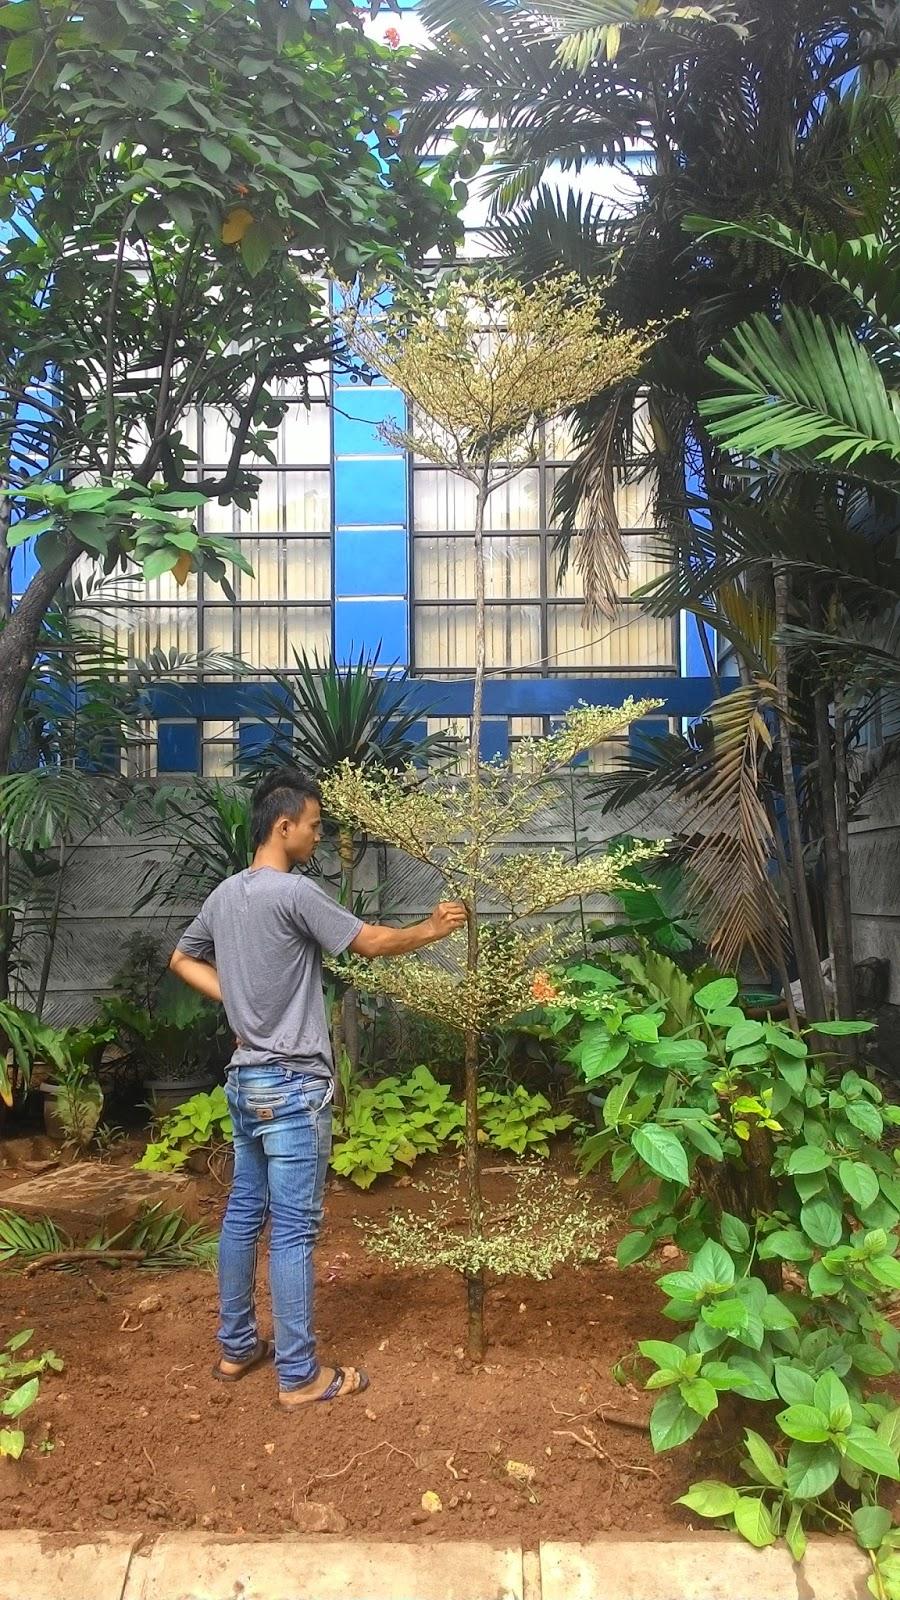 Jual Pohon Ketapang Kencana Daun Hijau Murah  Gambar